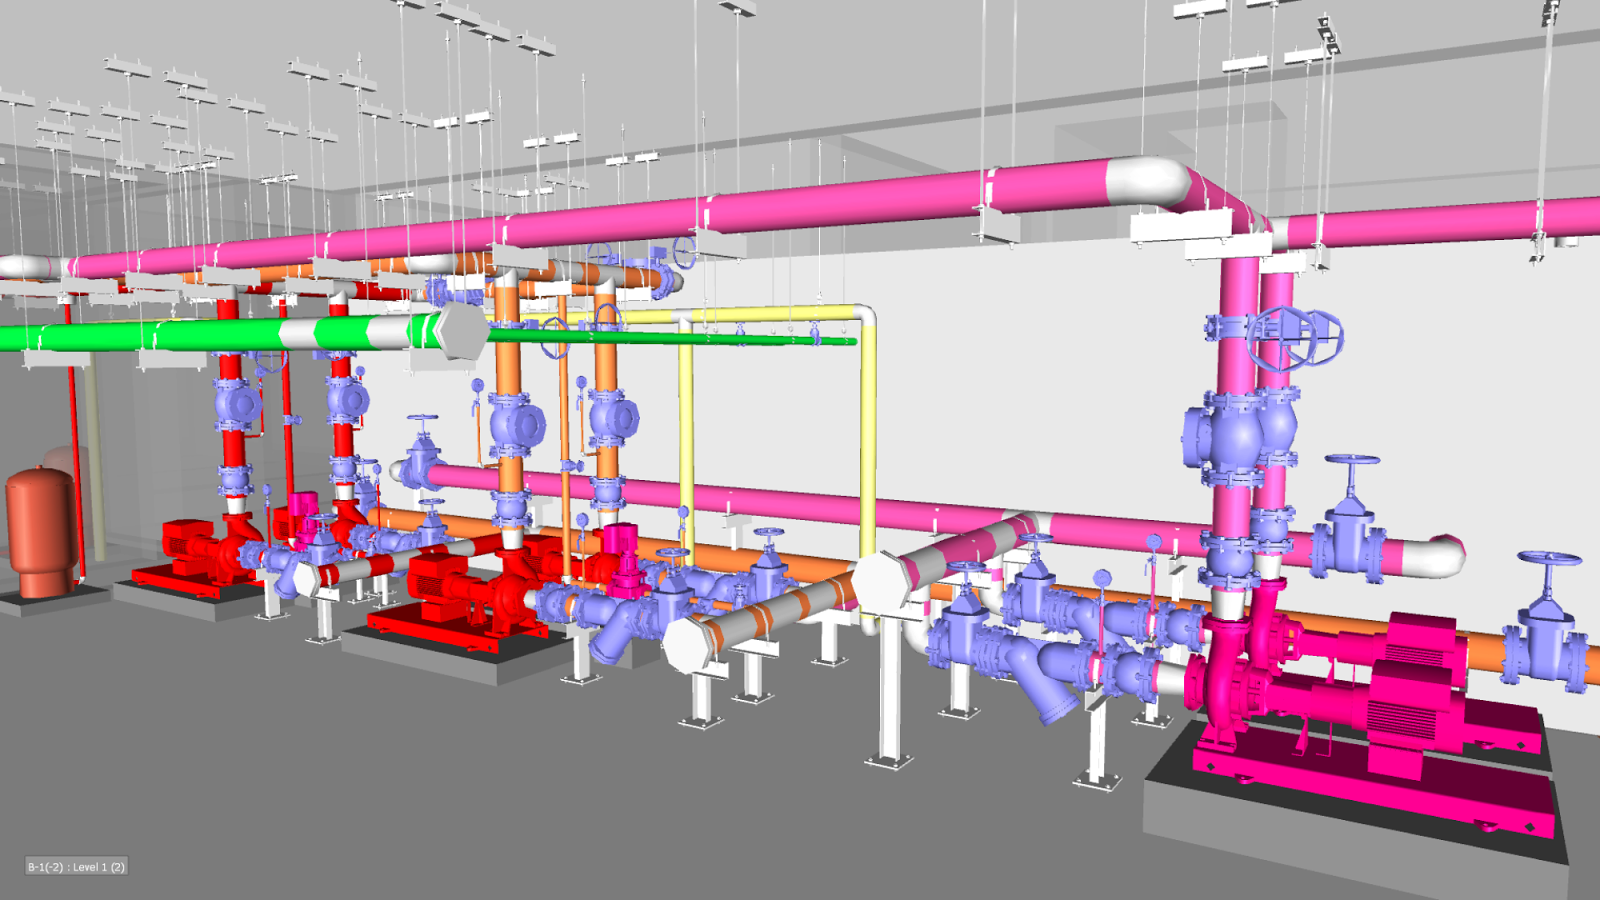 medium resolution of fire pump room autocad layouts